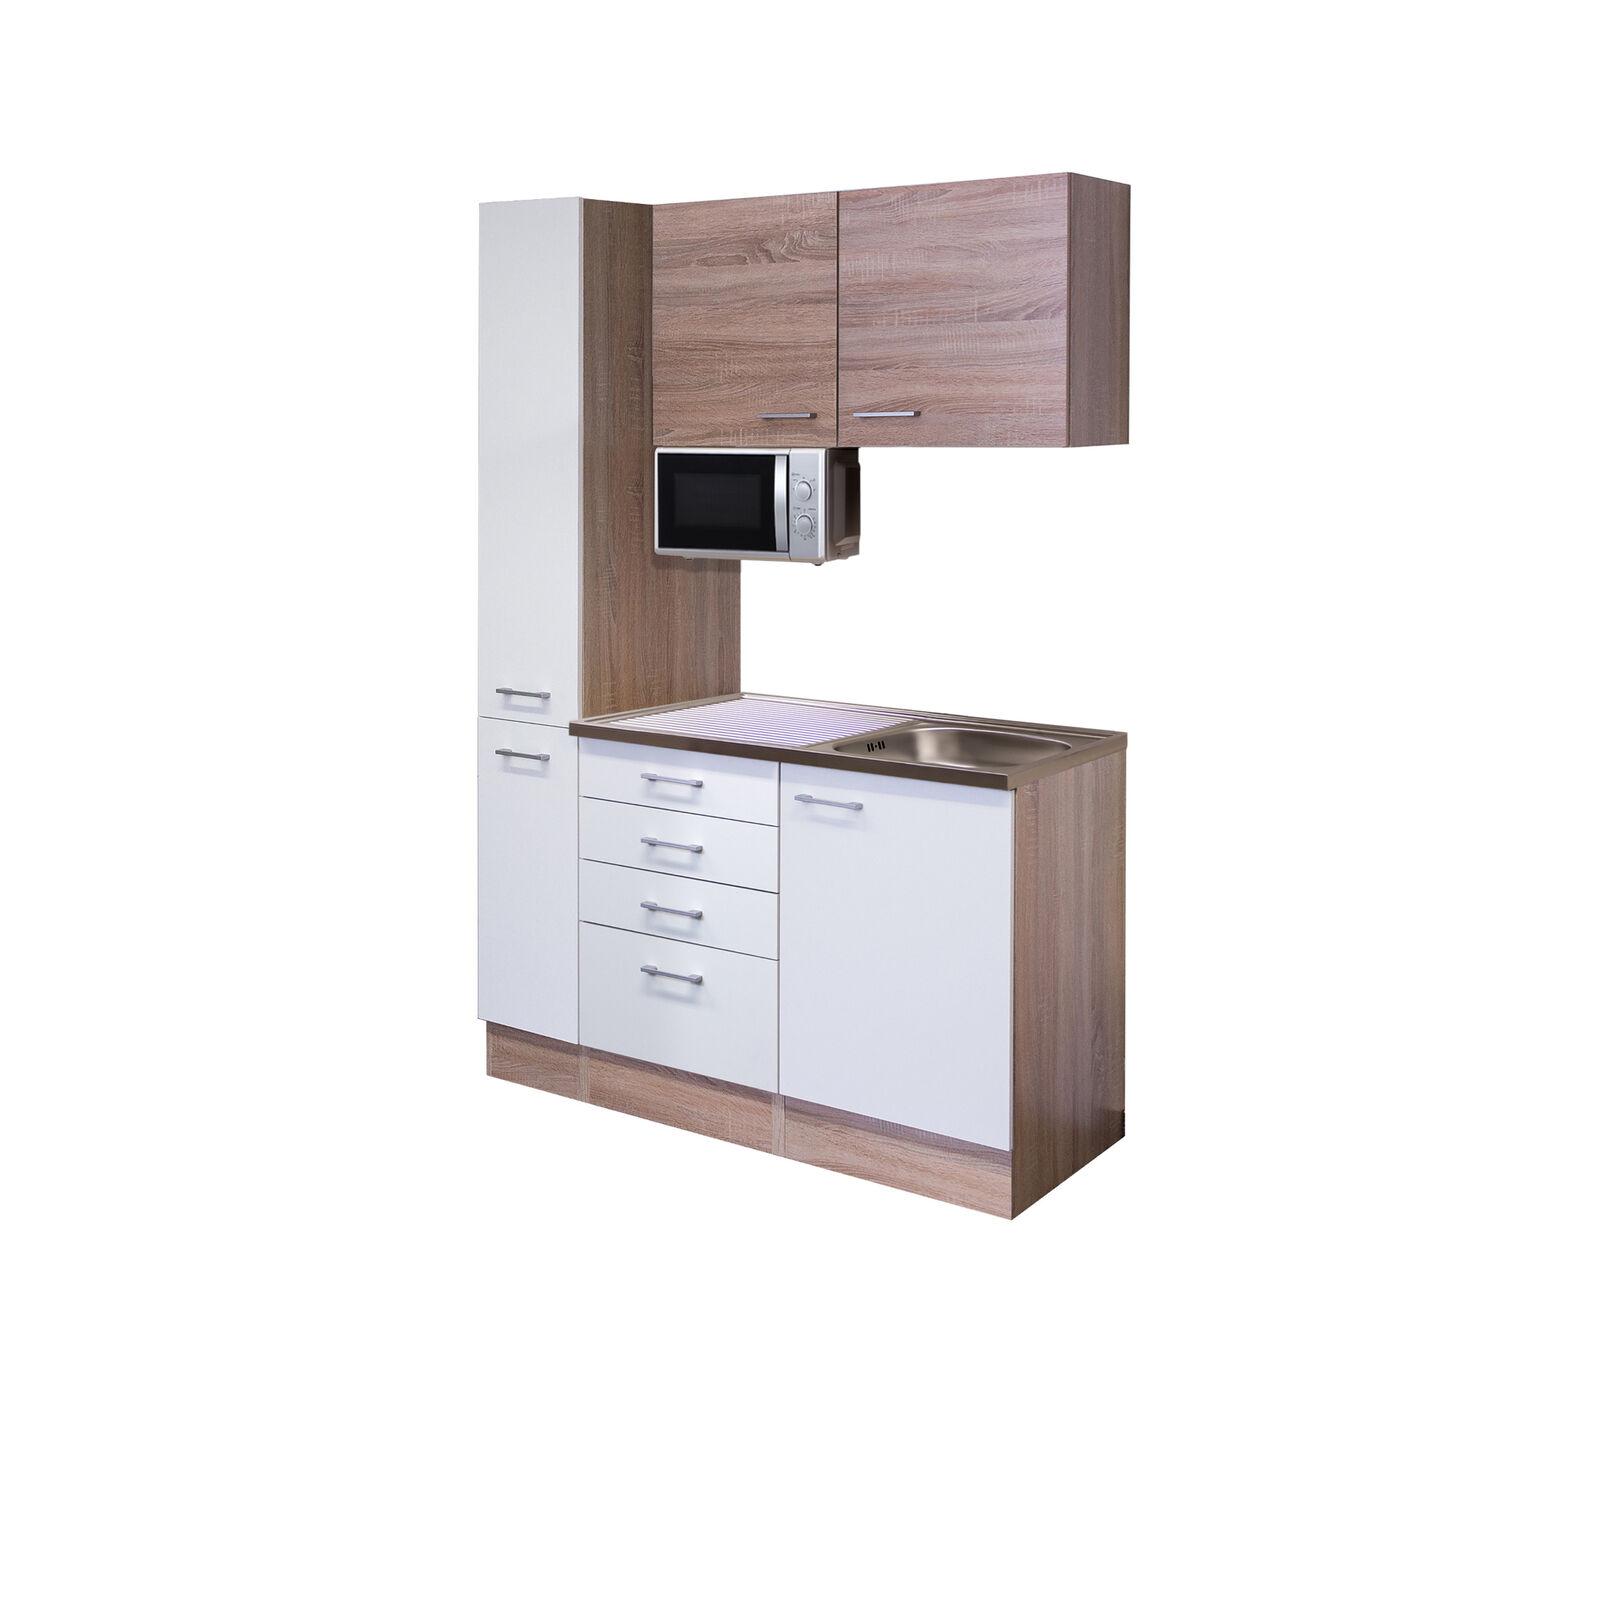 Büroküche Teeküche Miniküche Singleküche mit Spüle Mikrowelle Küche 130 cm weiss